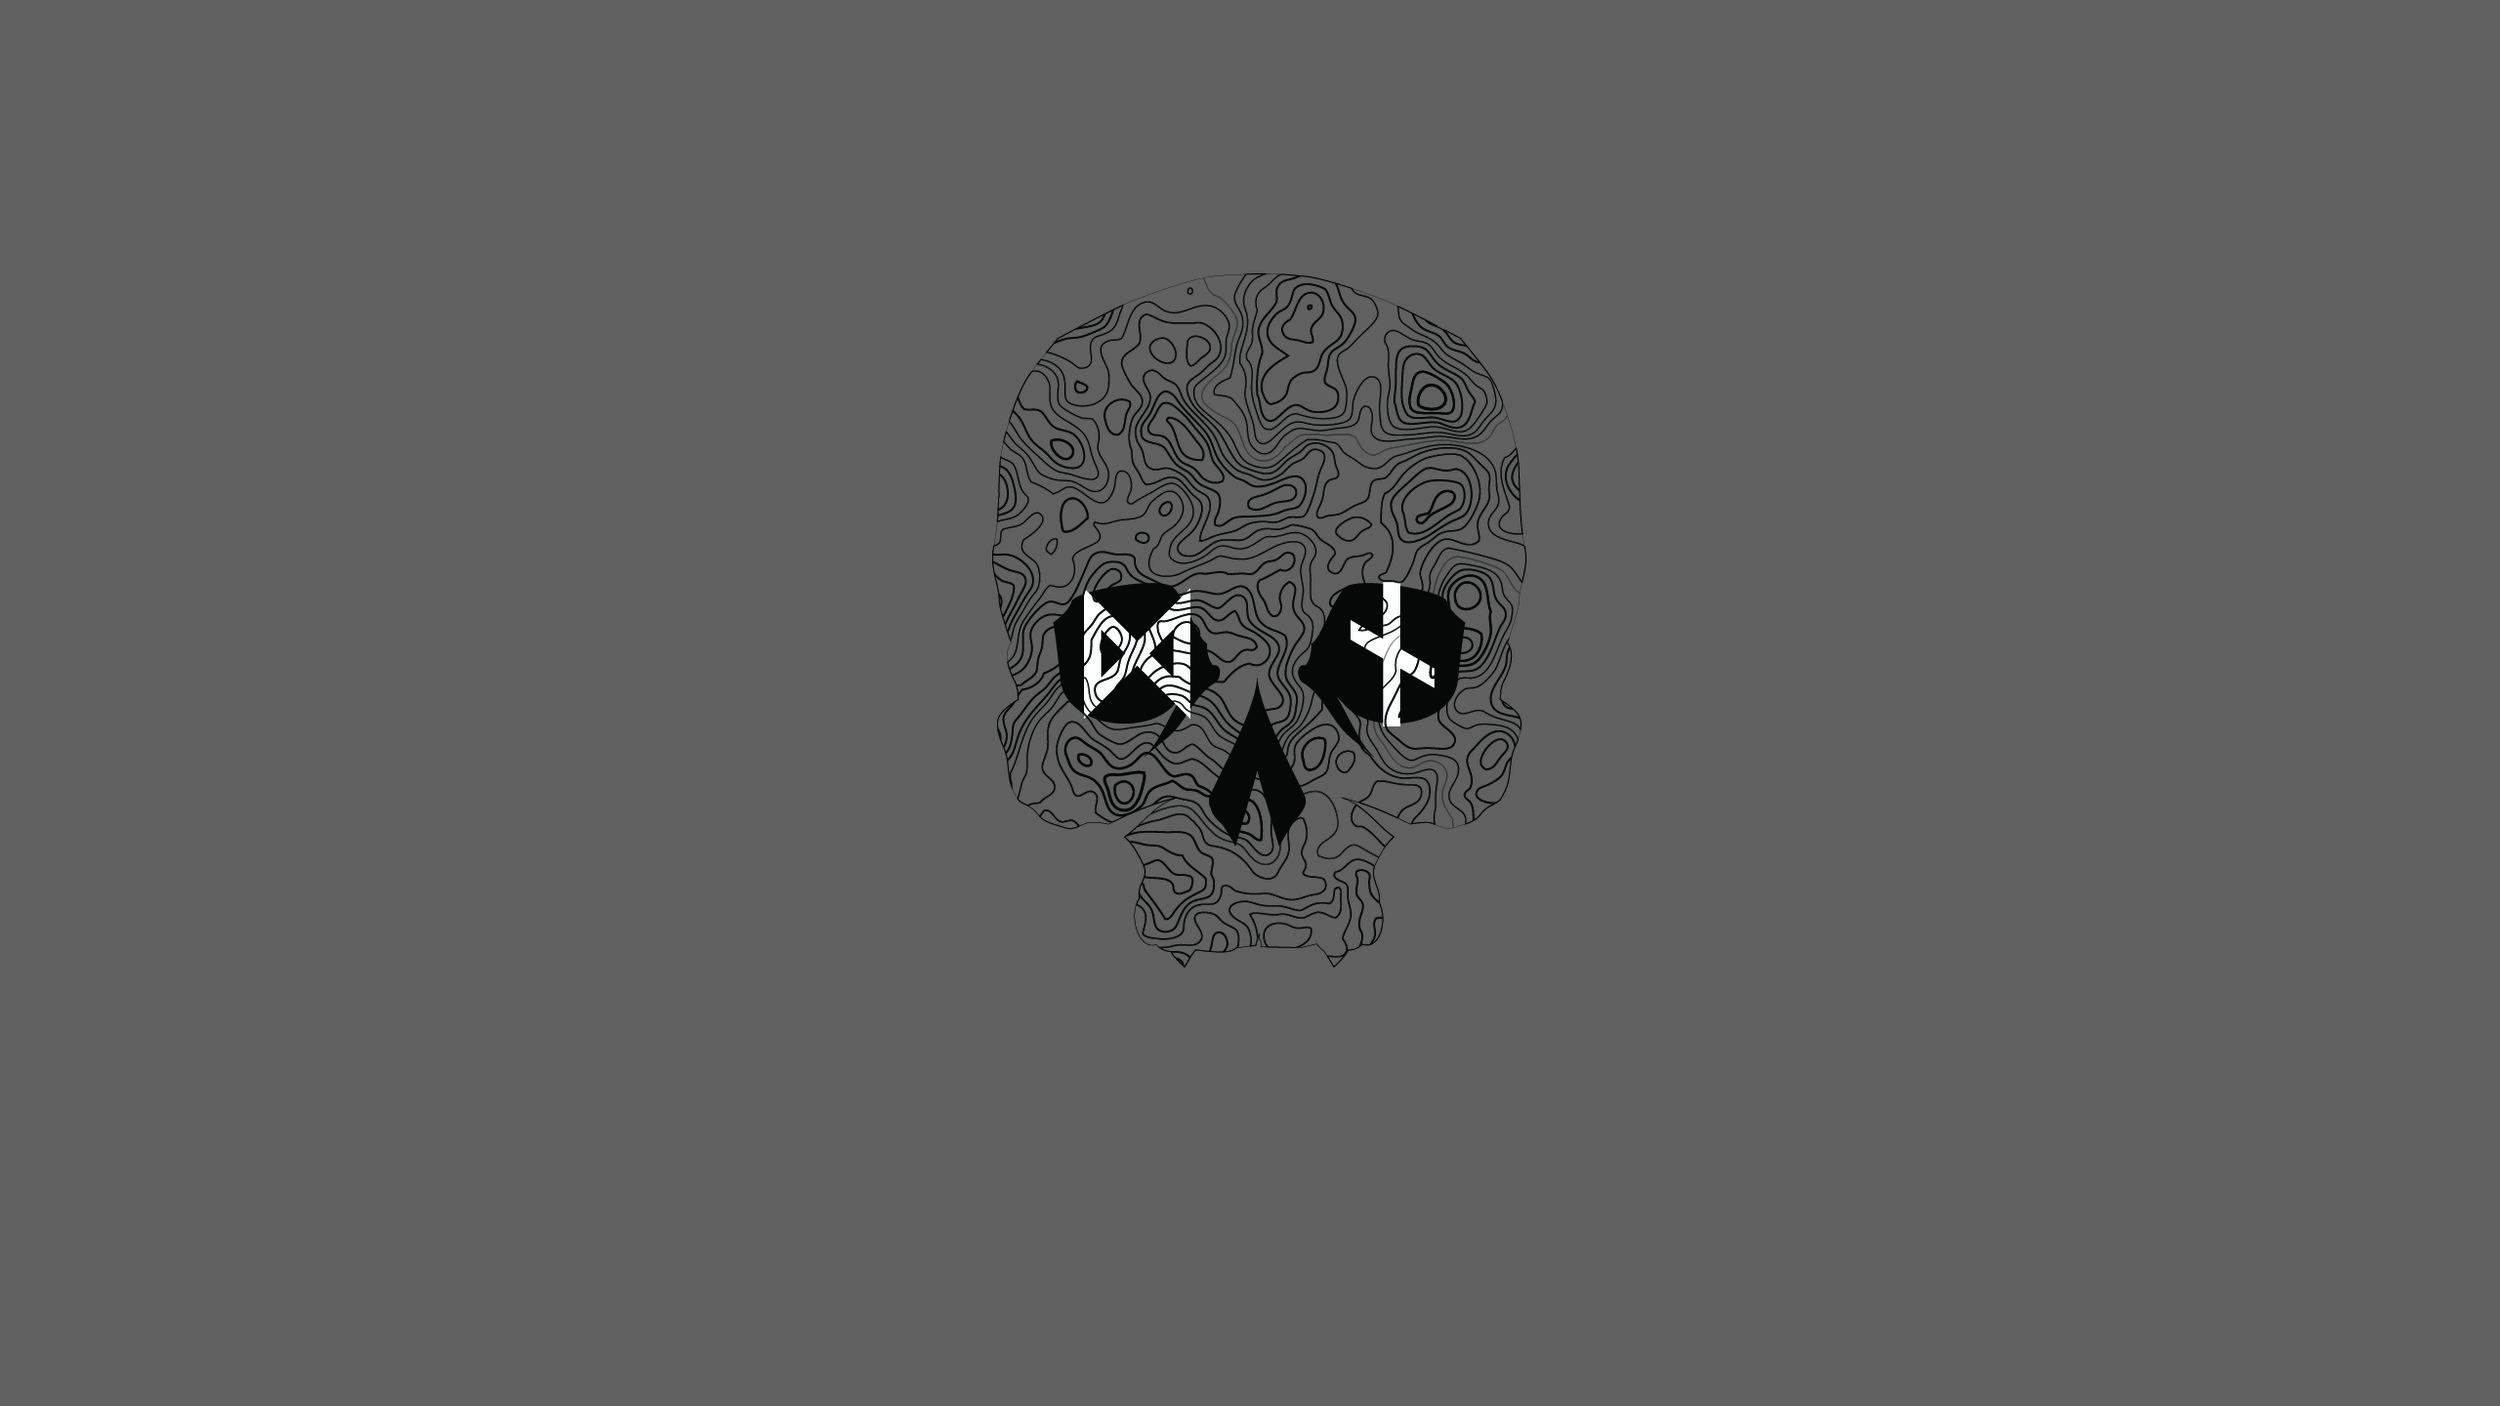 wallpaper-grey.jpg